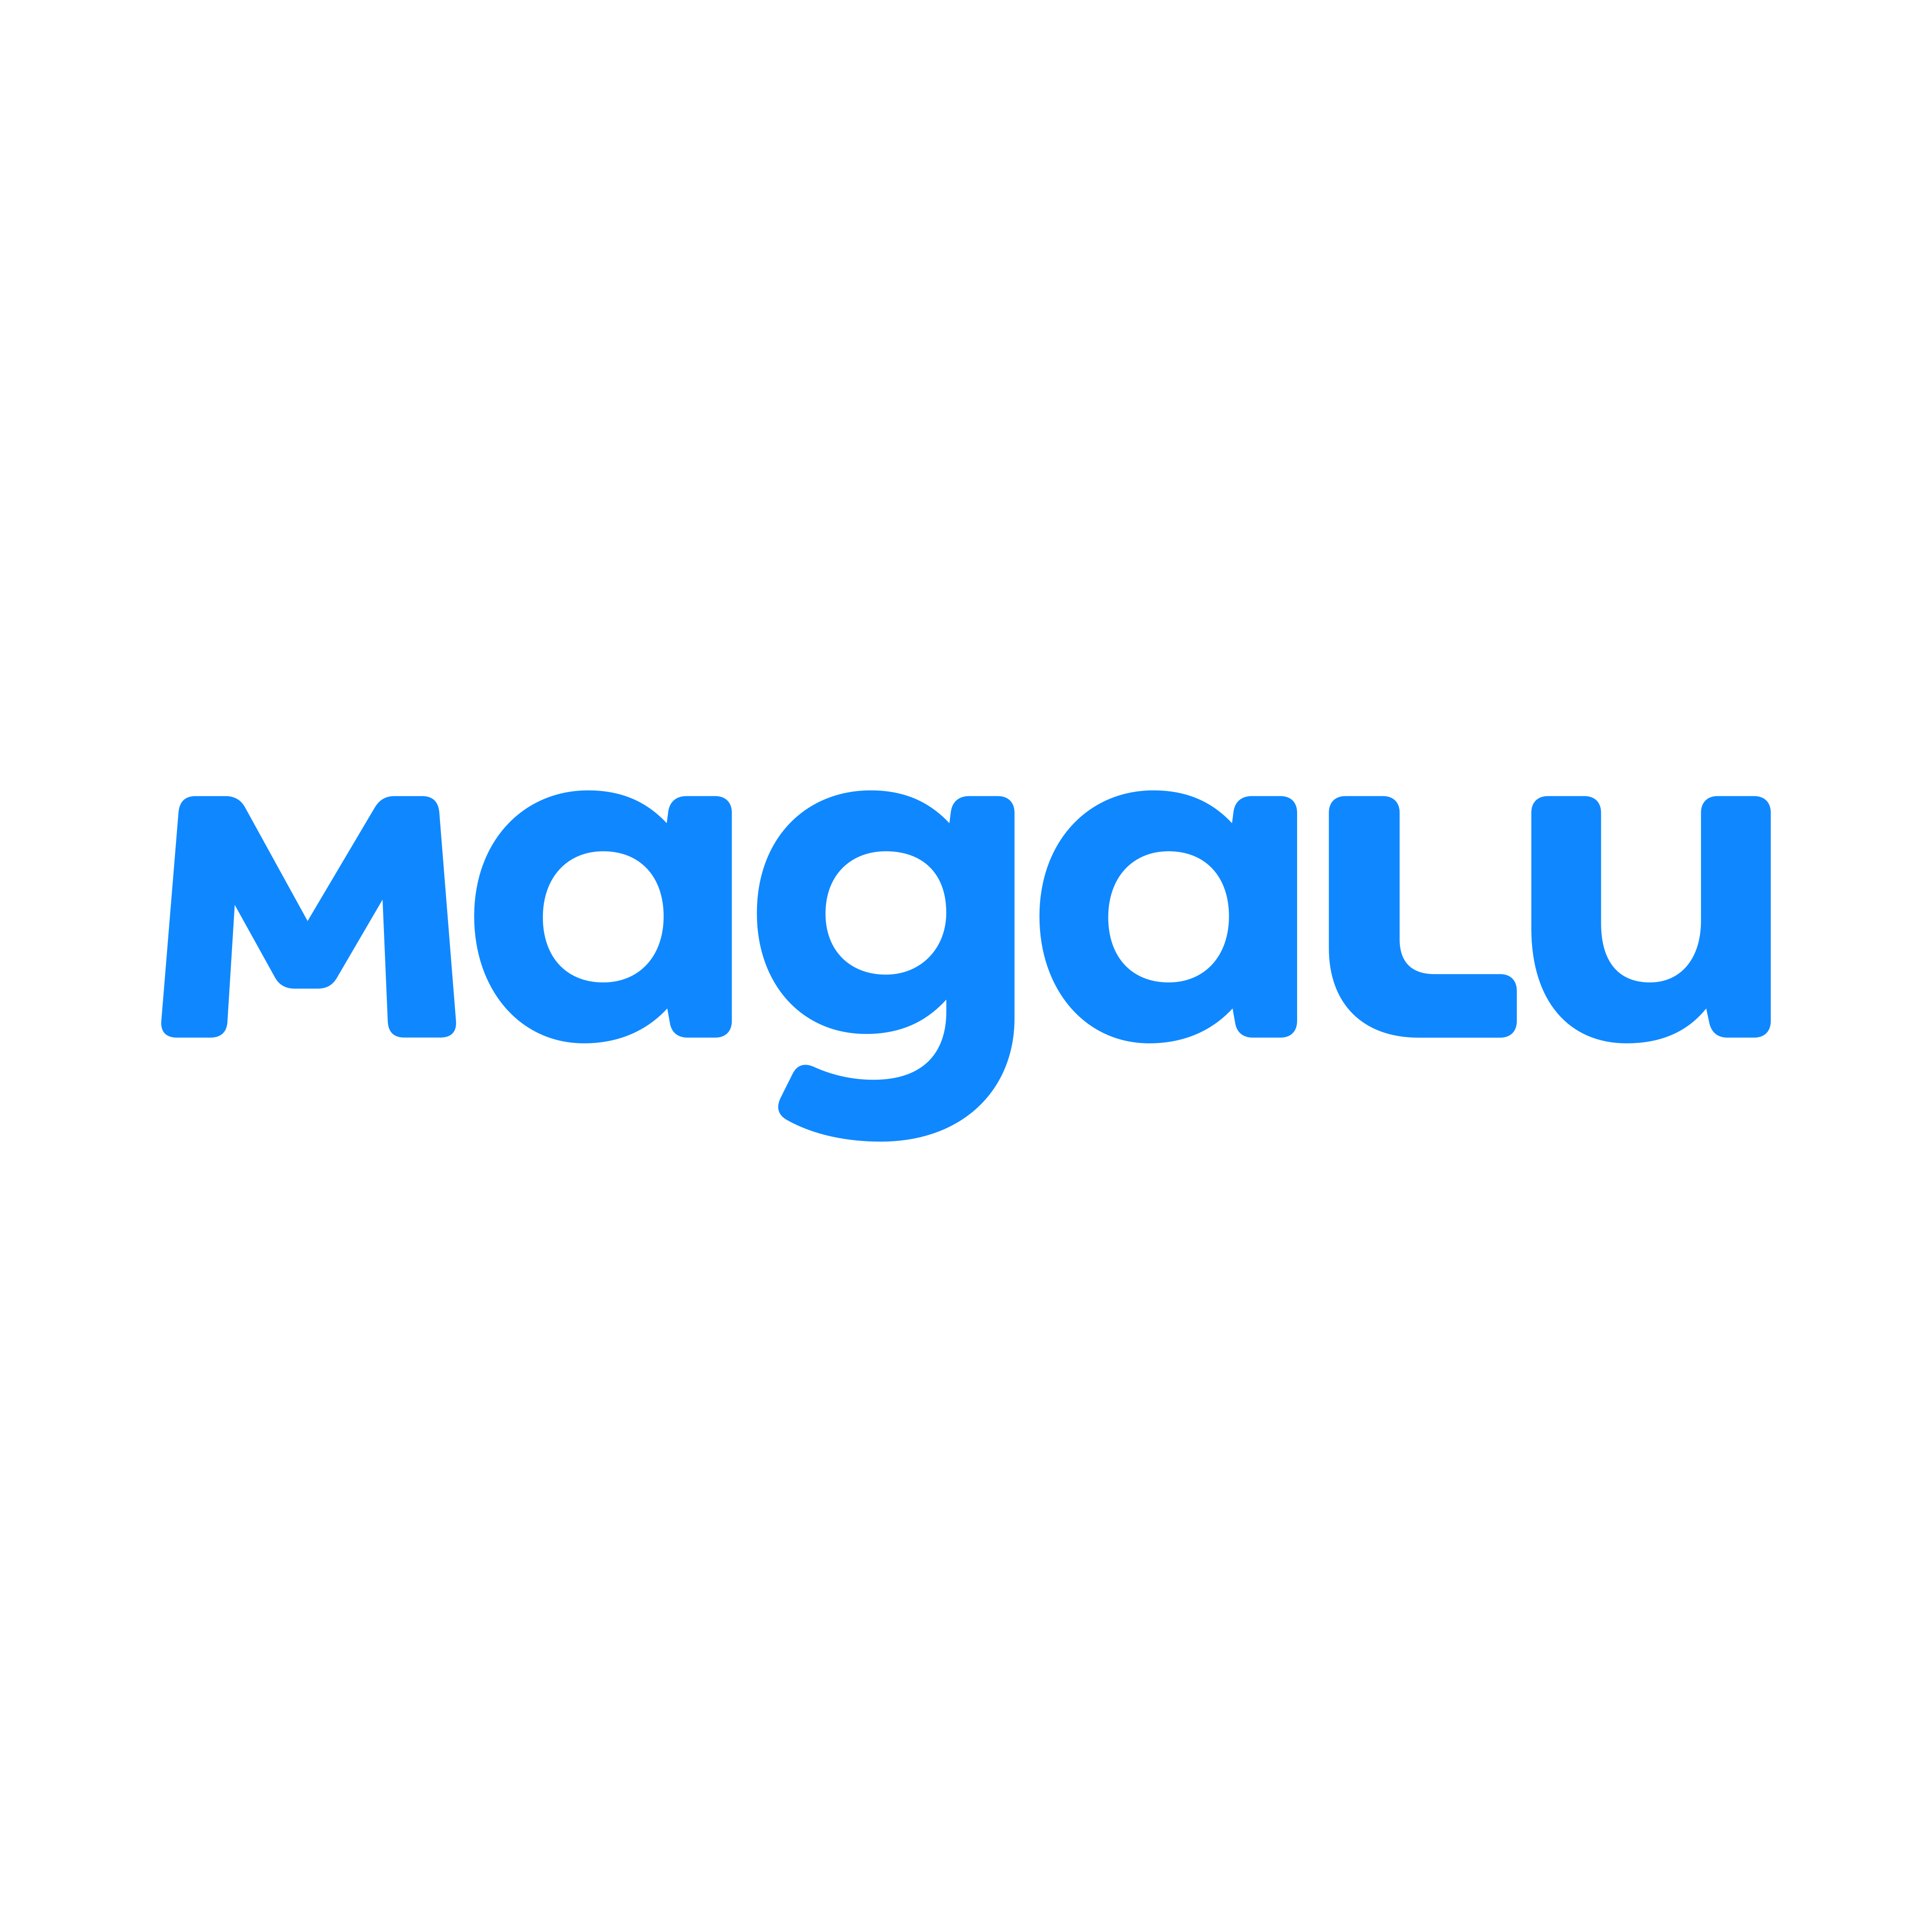 magalu logo 0 - Magalu Logo